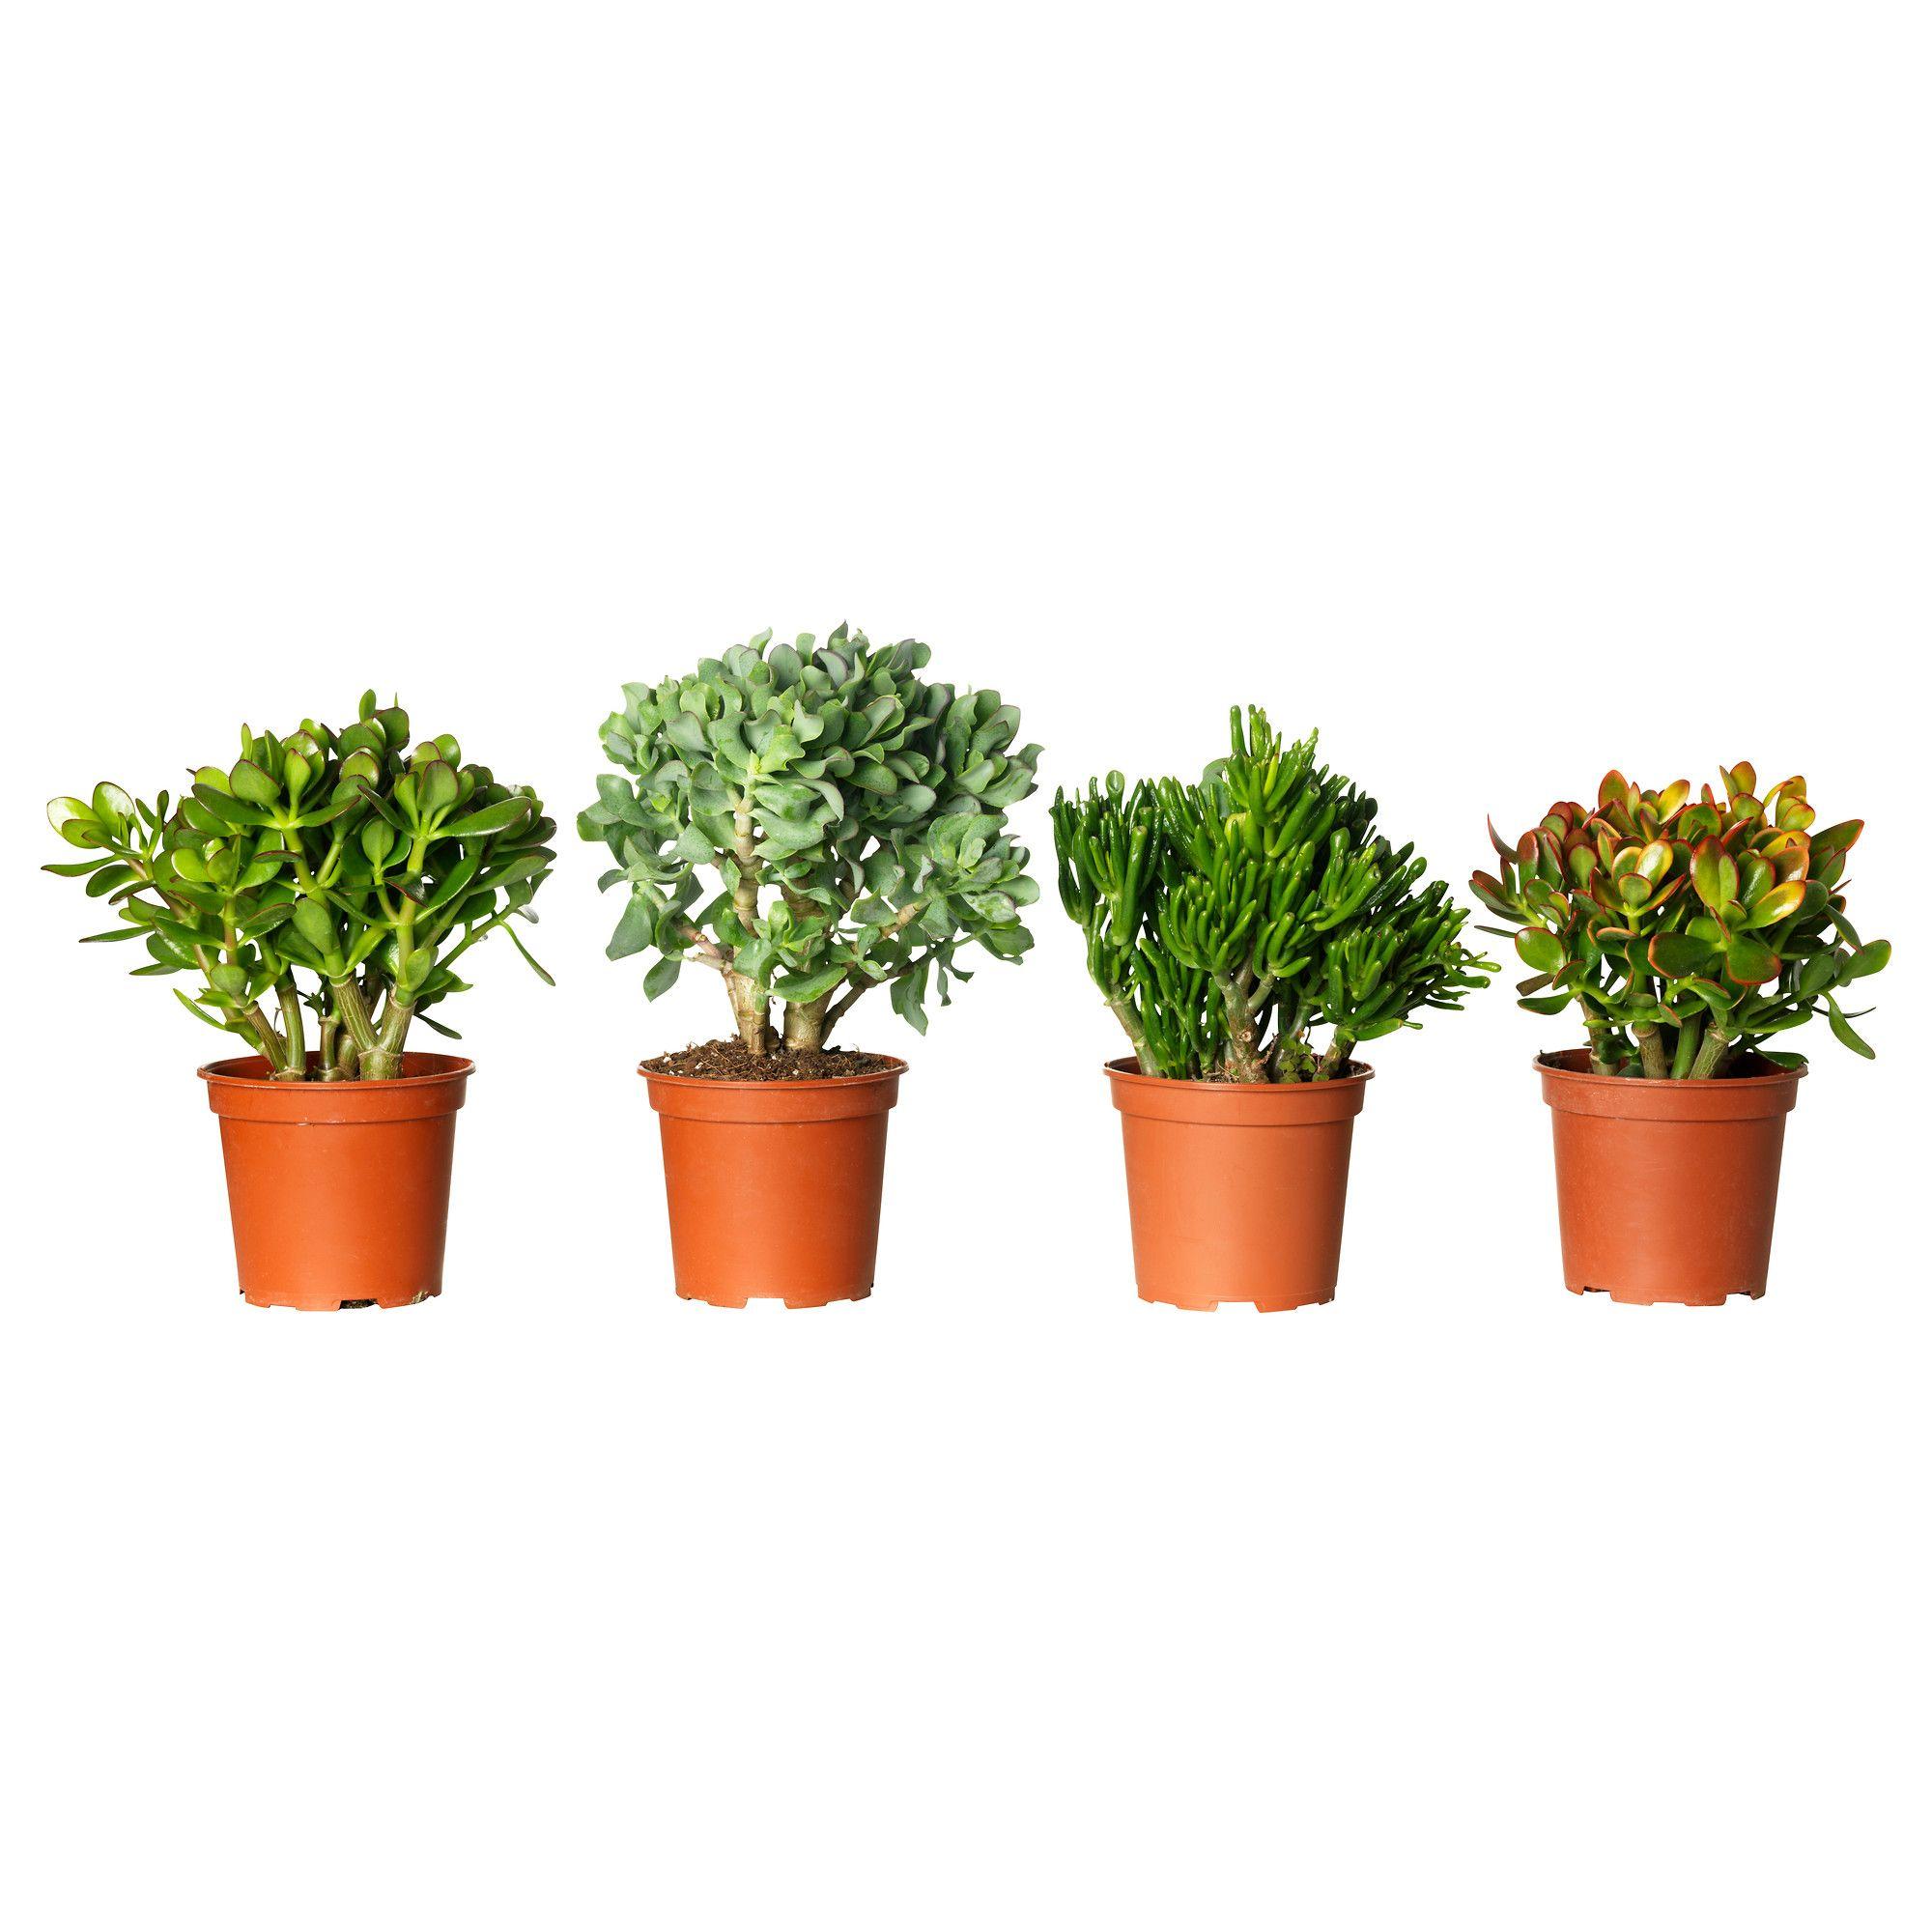 Crula Potted Plant Ikea